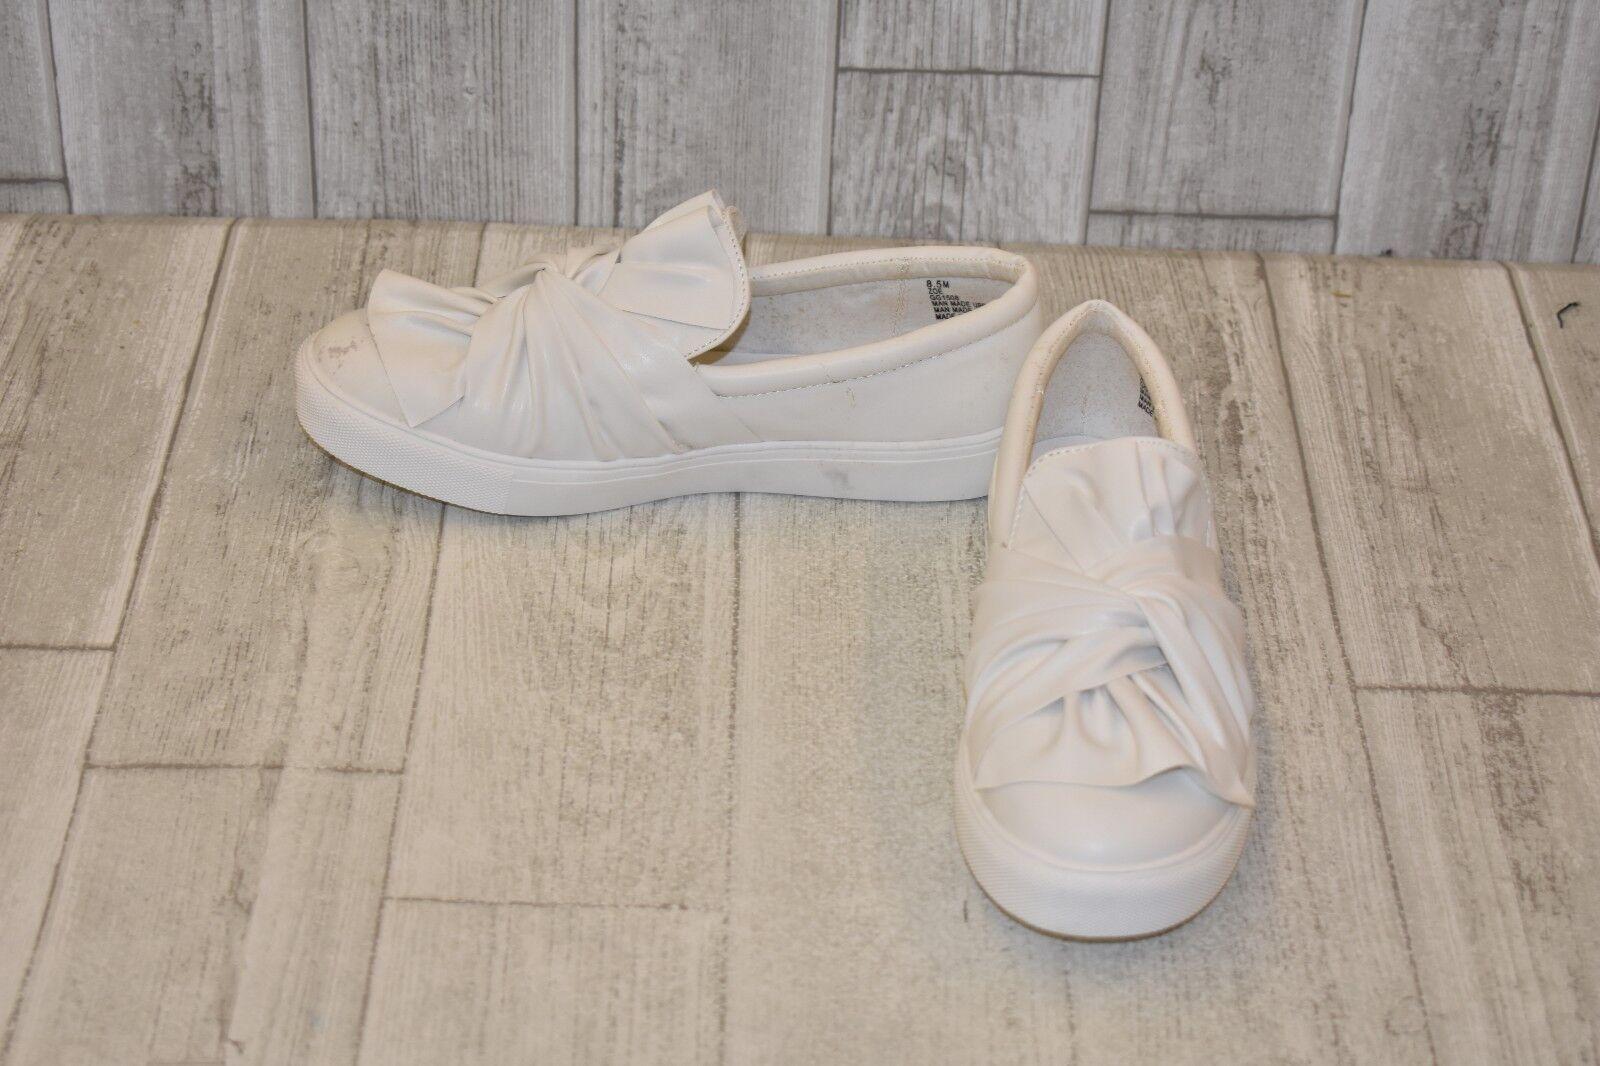 MIA Zoe Slip-On Sneaker, Women's Size 8.5 M, White